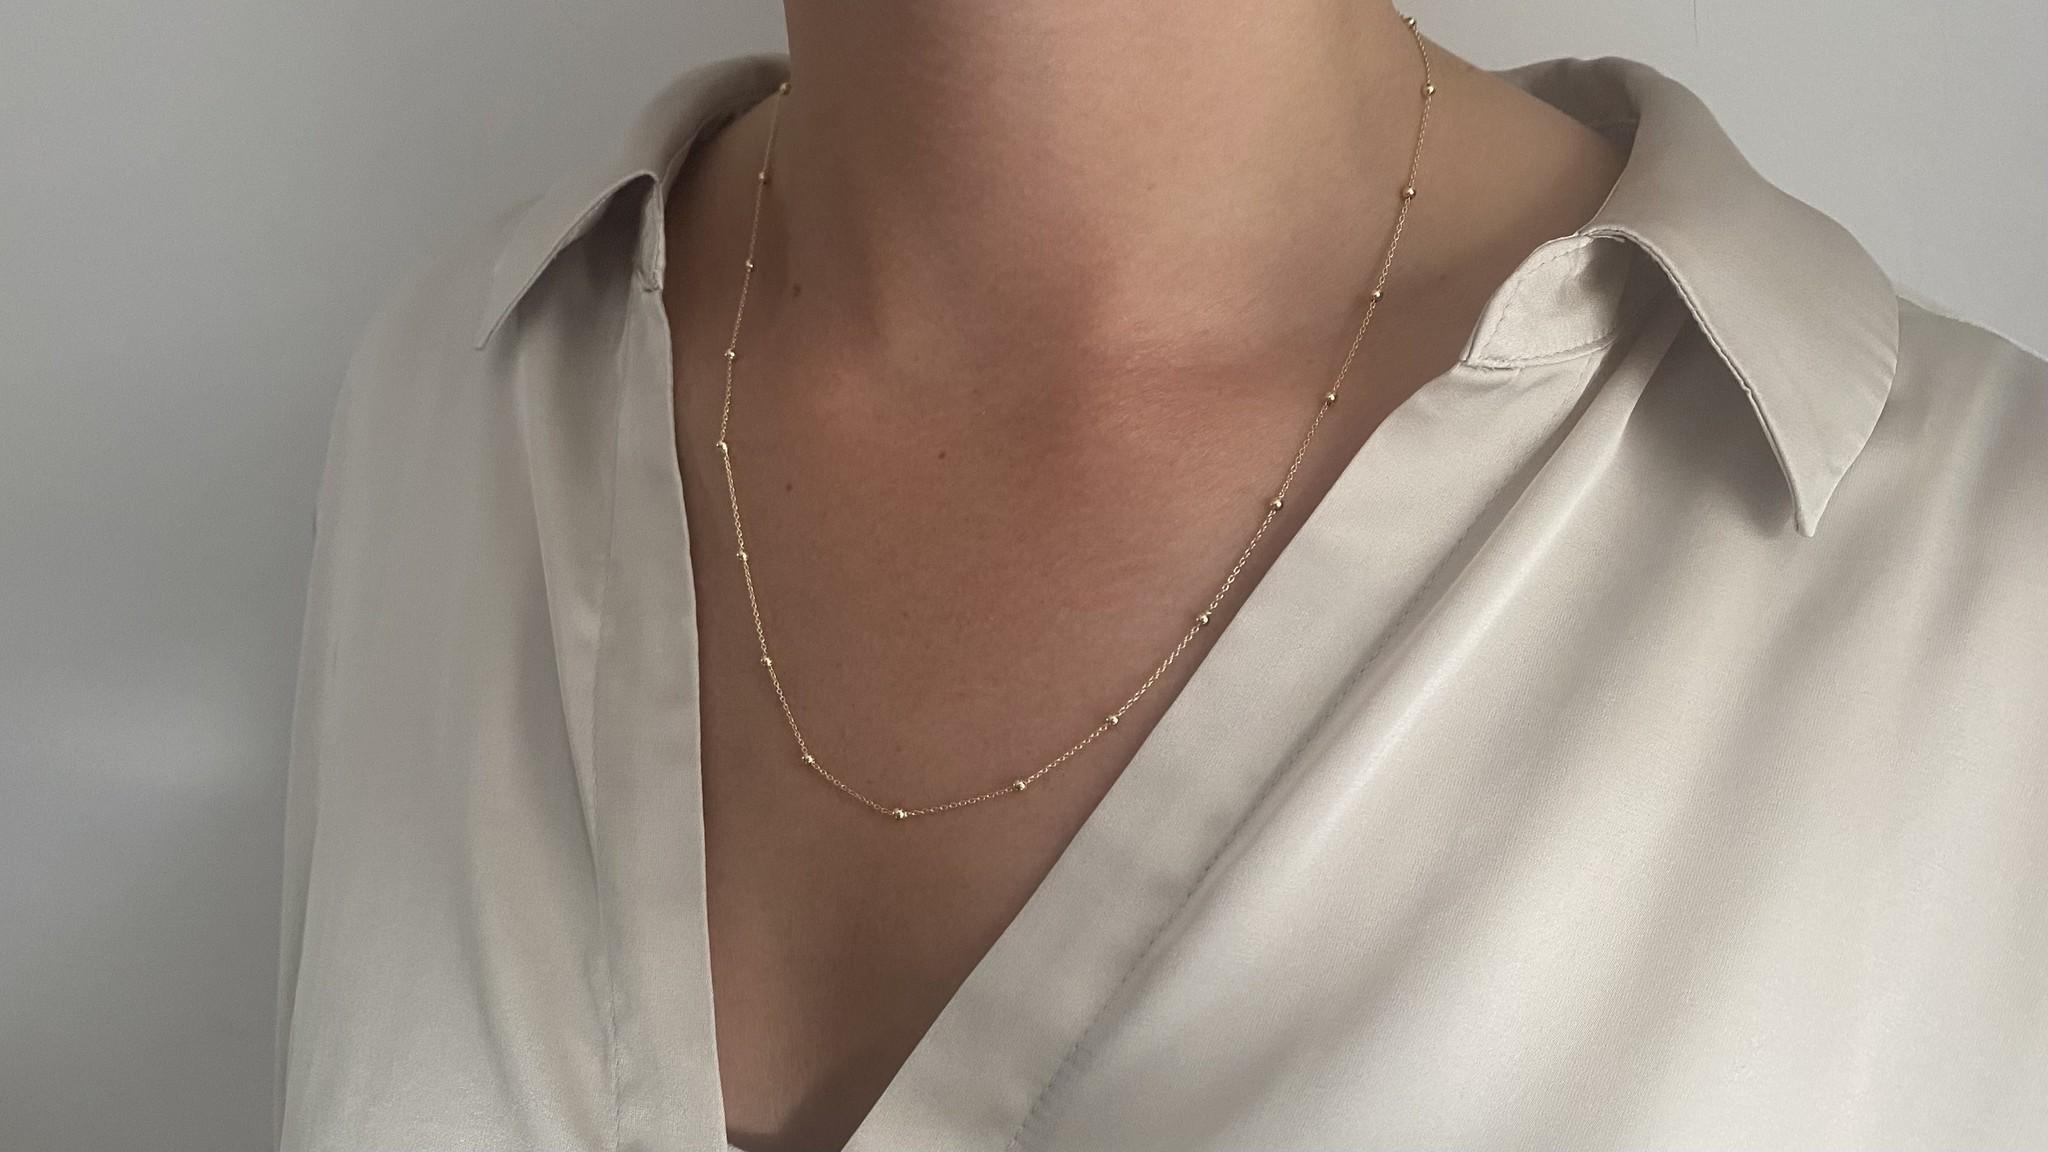 Ketting subtiele chain met balletjes-1